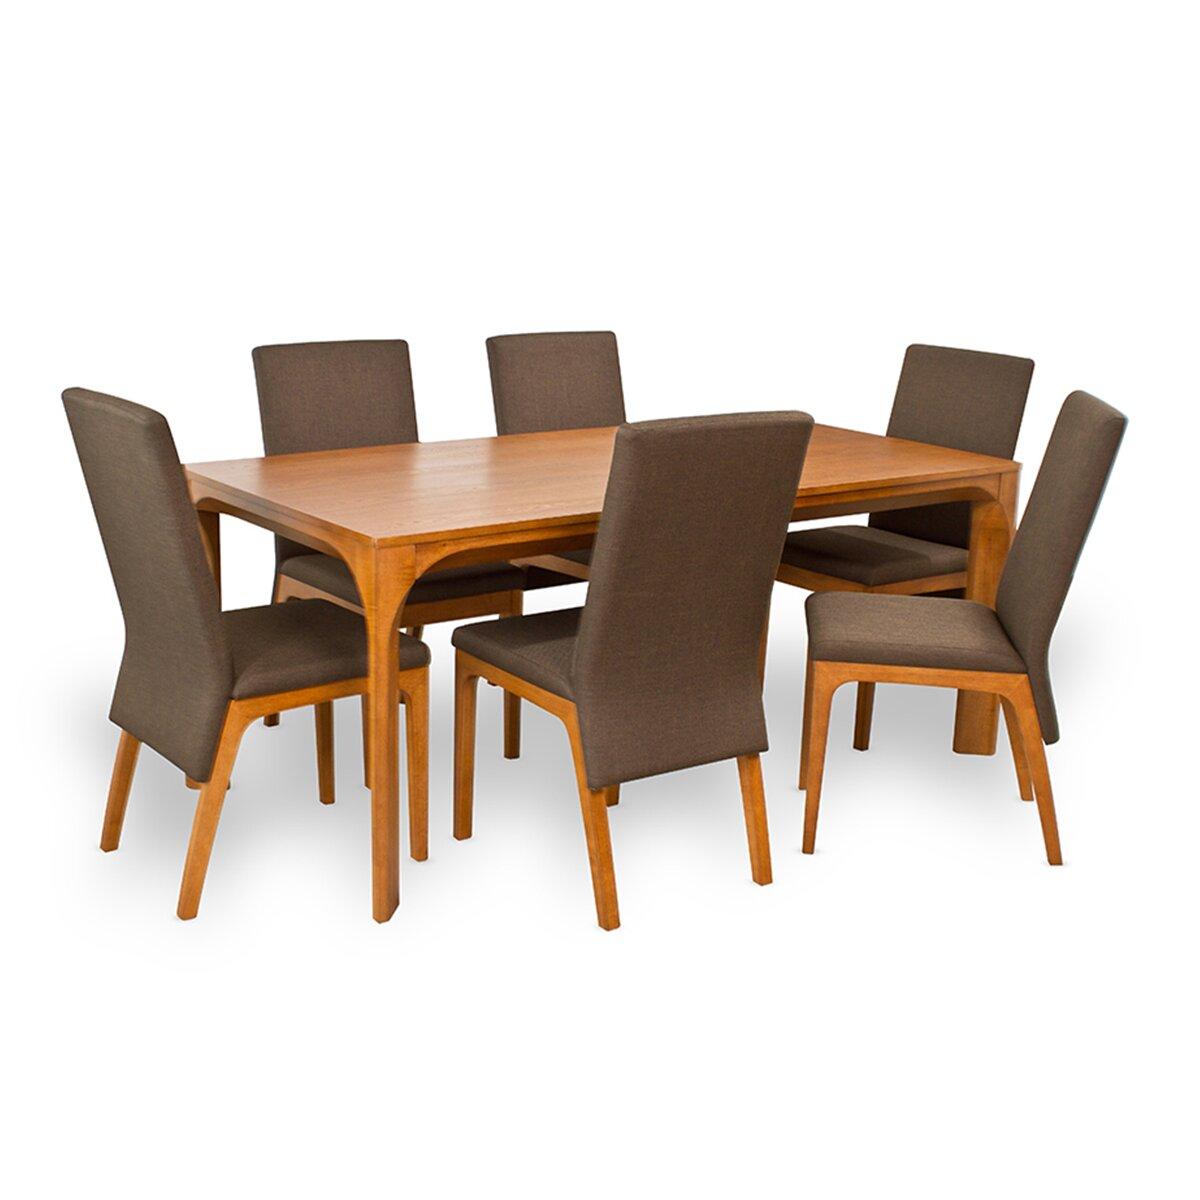 Furniture Imports: Wholesale Furniture Imports Lenox 7 Piece Dining Set